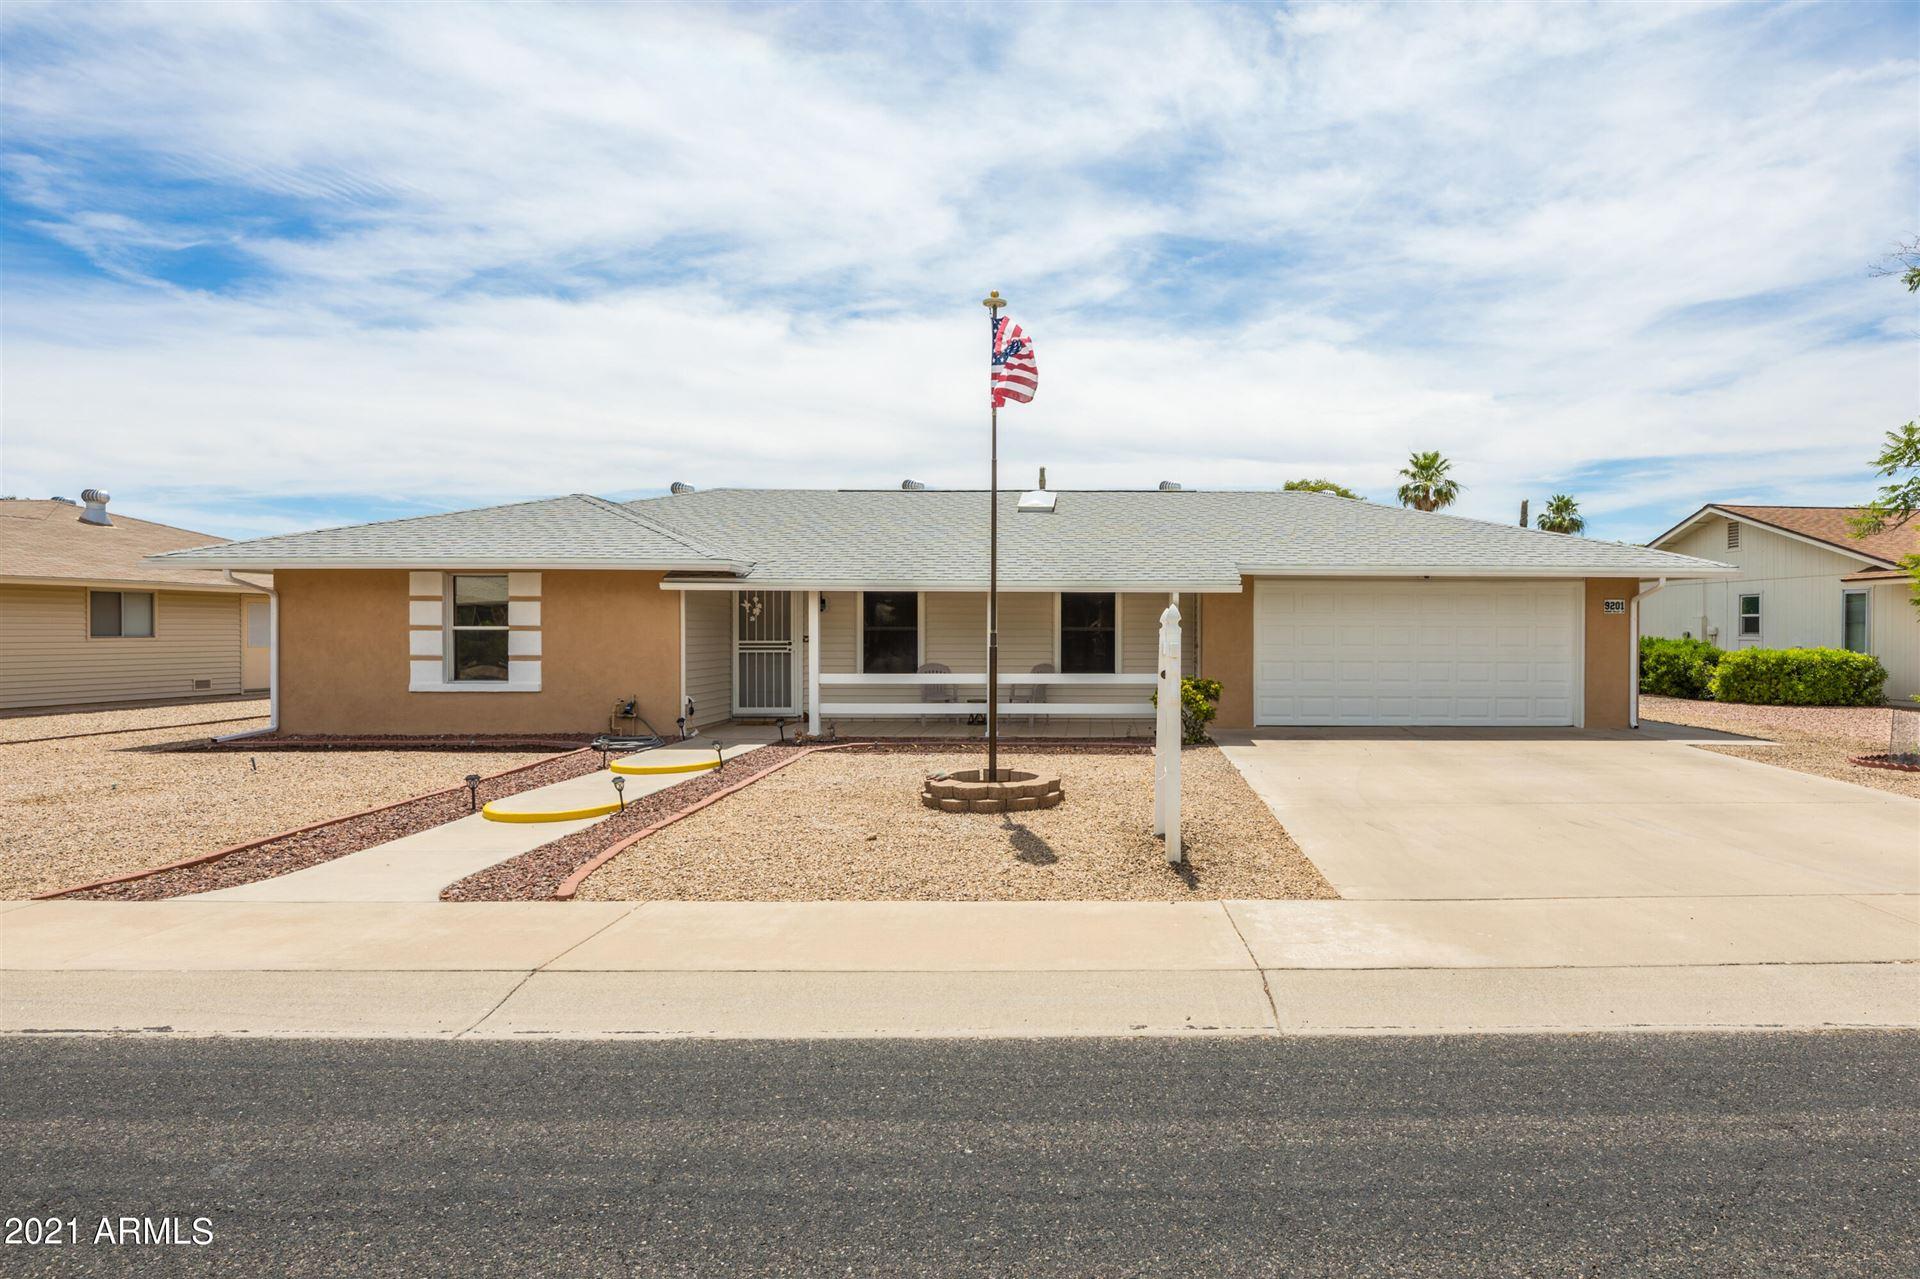 Photo of 9201 W HIDDEN VALLEY Lane, Sun City, AZ 85351 (MLS # 6236410)